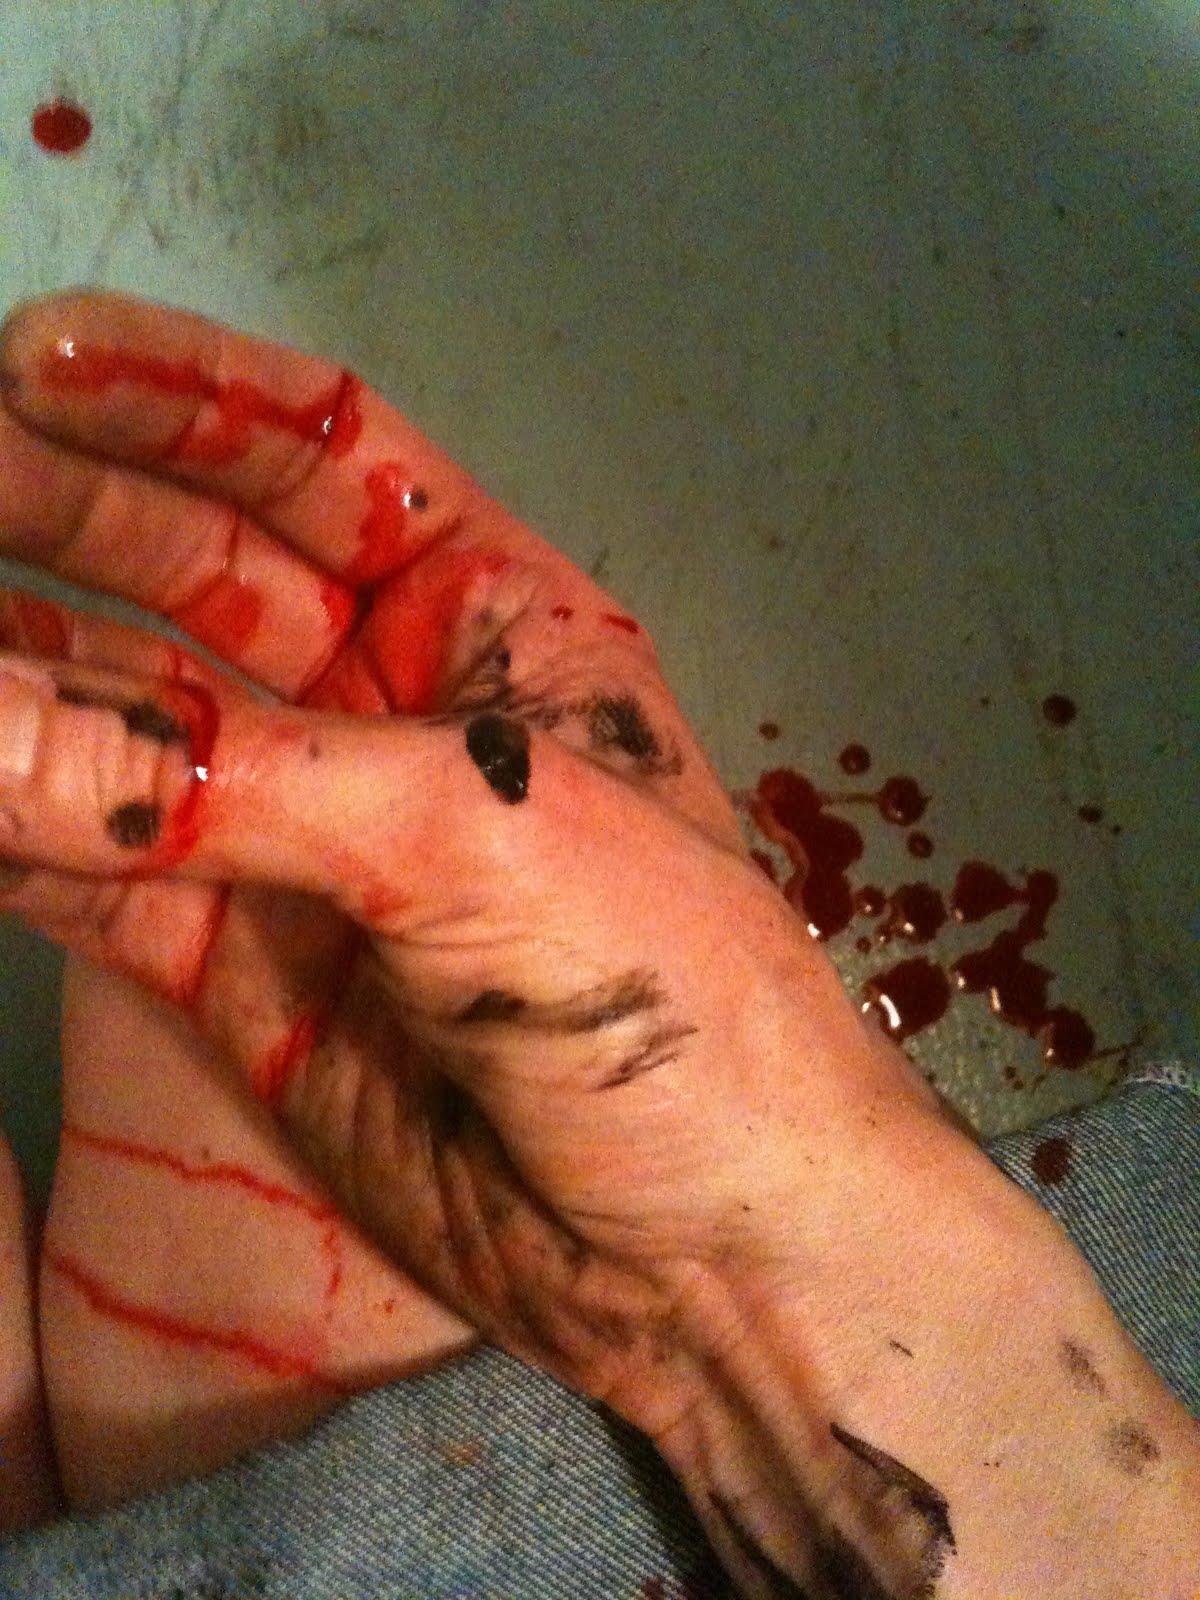 Can A Knife Cut Glass